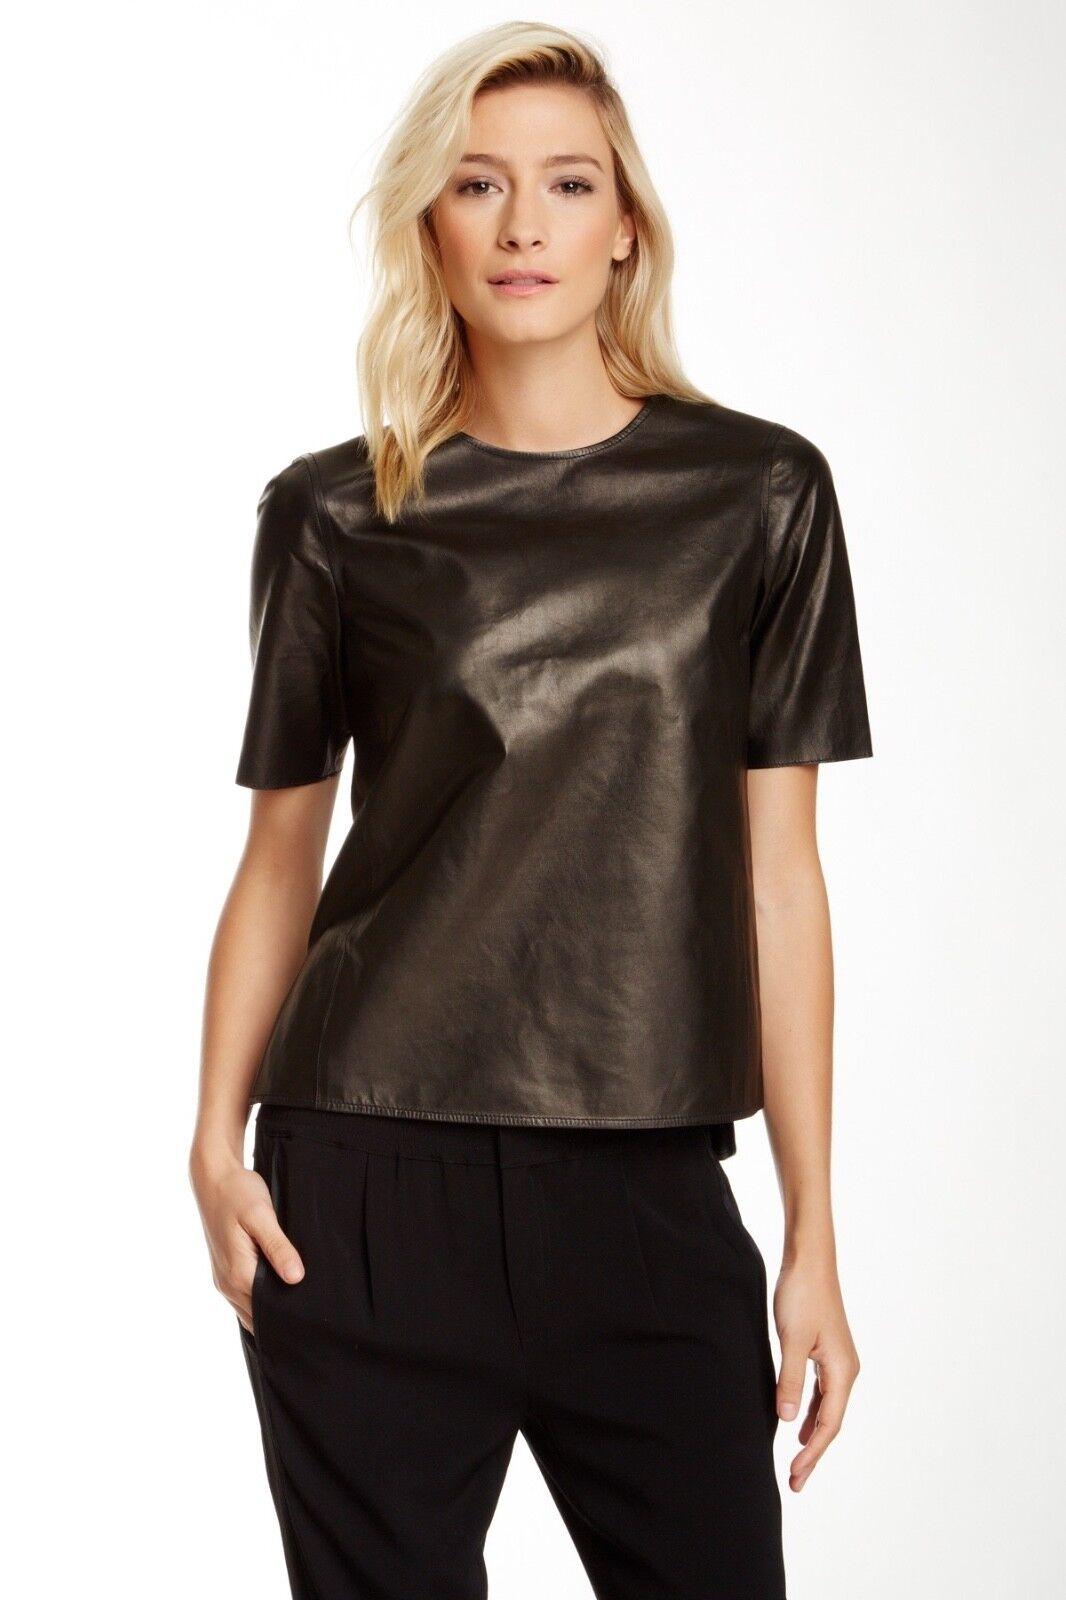 Vince schwarz Leather Short Sleeve Crew Neck T-Shirt Größe XS NEW